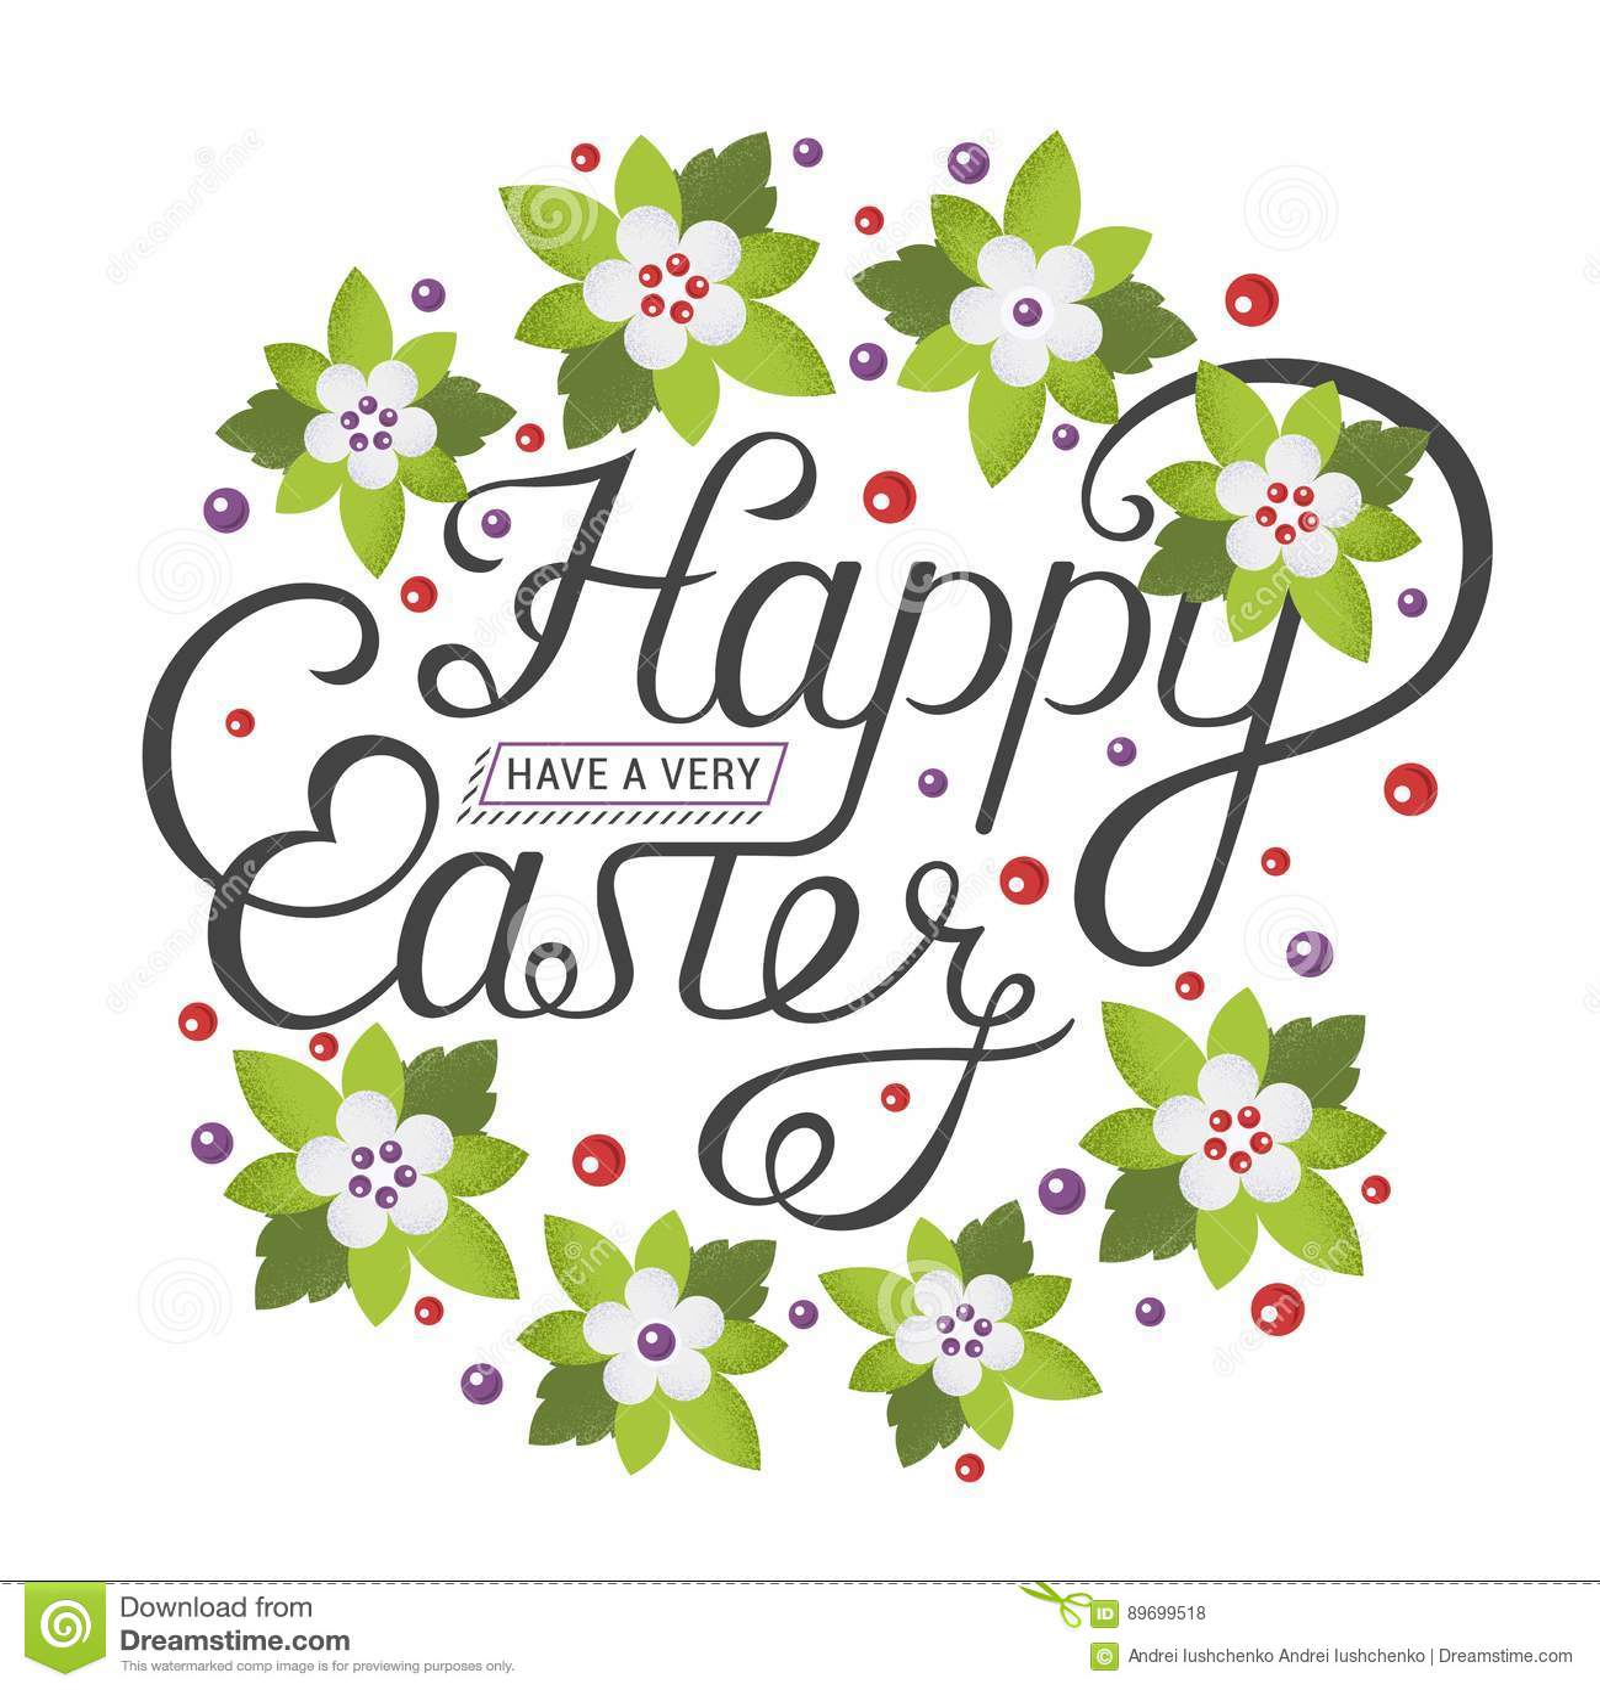 Happy Easter Vintage Lettering For Greeting Card Stock Illustration